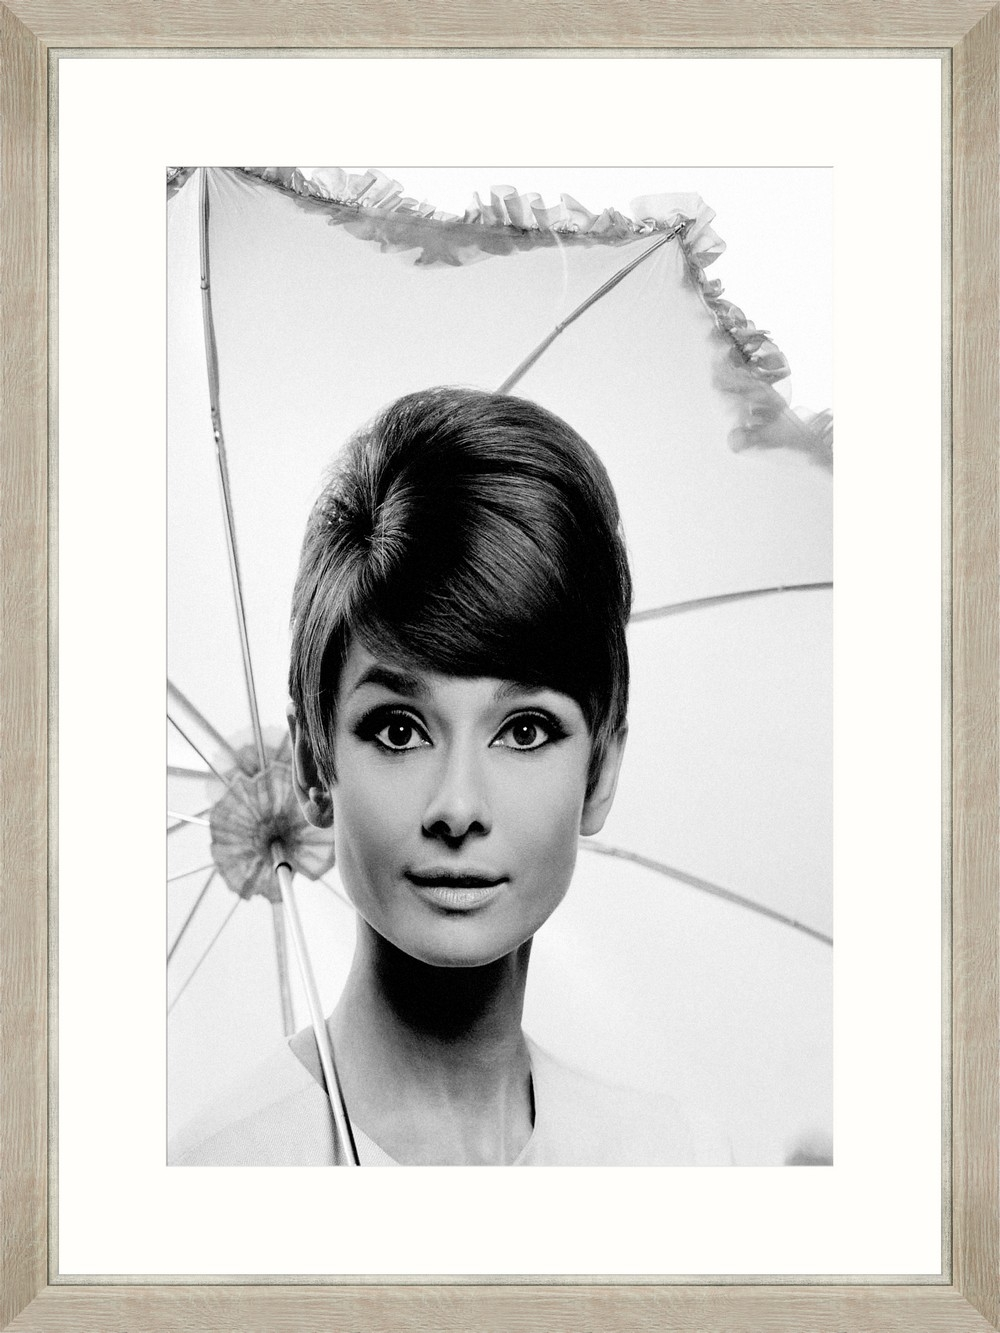 Tablou Framed Art Audrey Hepburn Under Umbrella poza